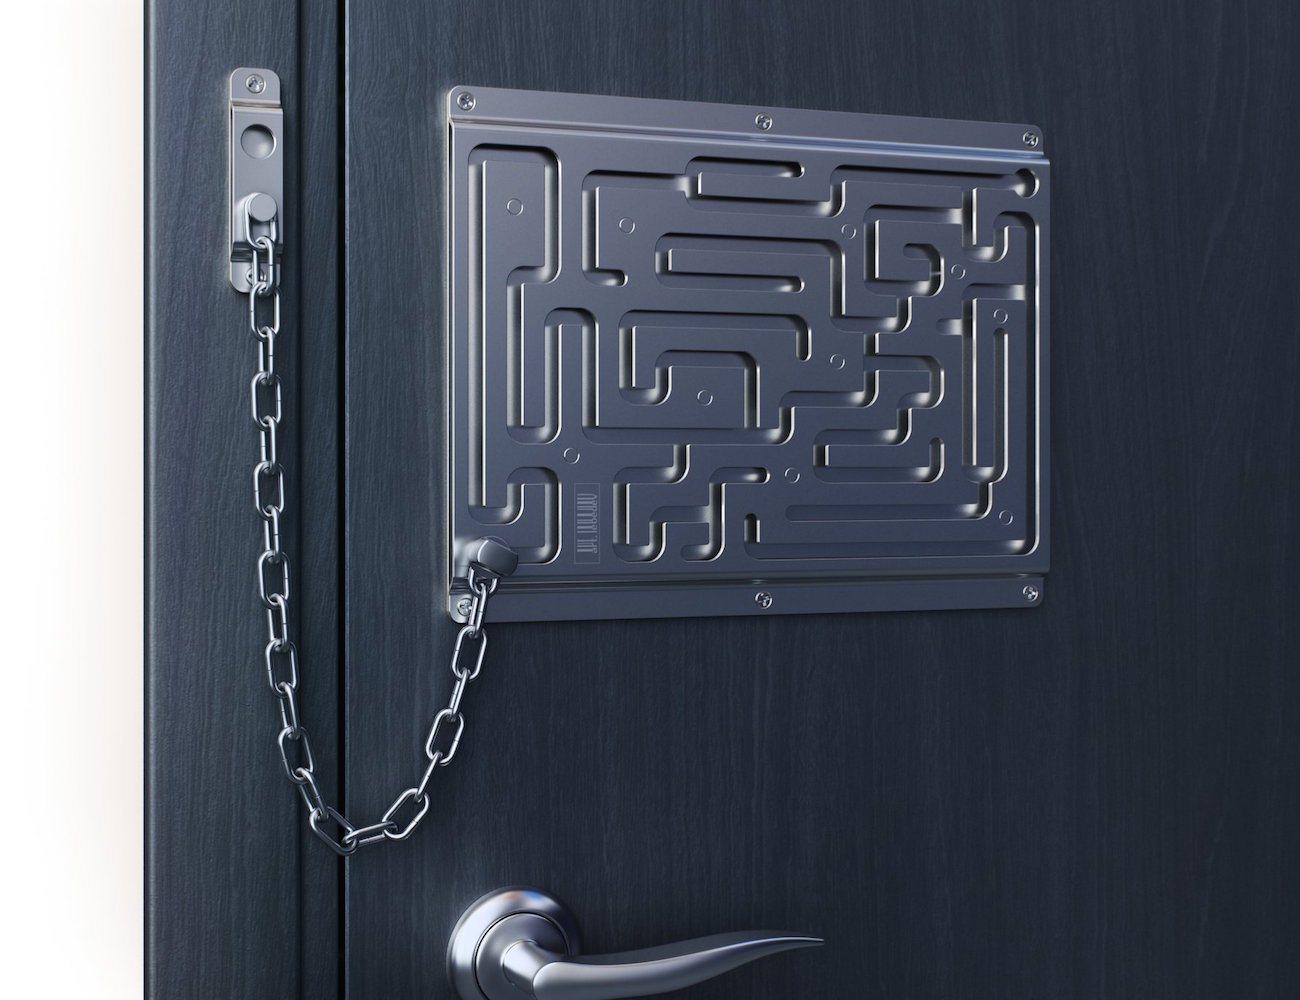 Defendius Labyrinth Security Lock 187 Review